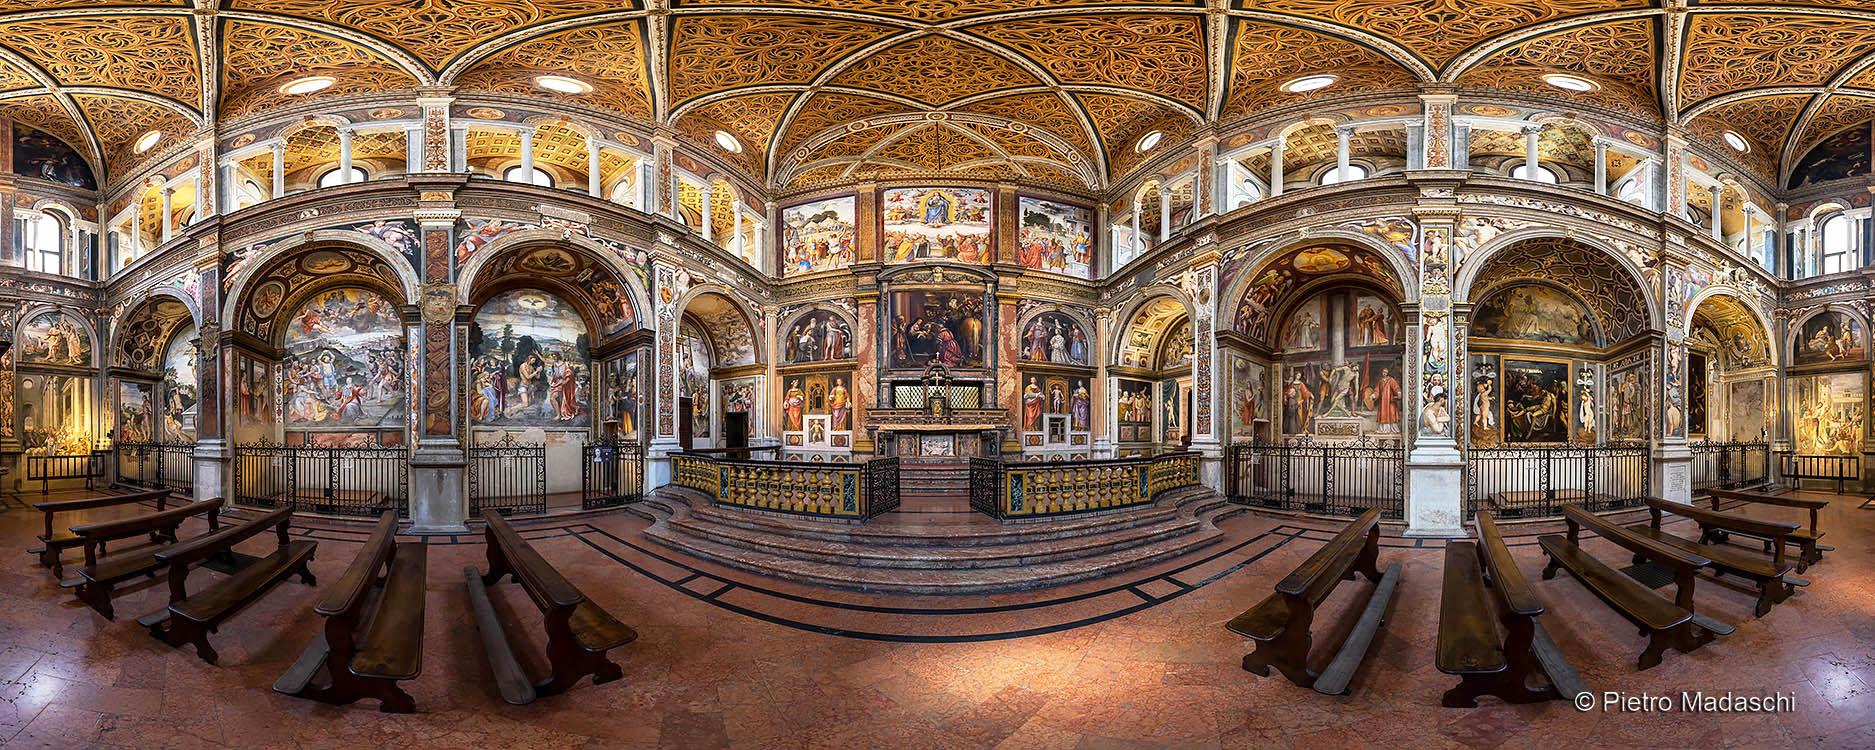 "St Maurizio at Monastry: the magnificent Hall of the Faithful, ""Aula dei Fedeli"""